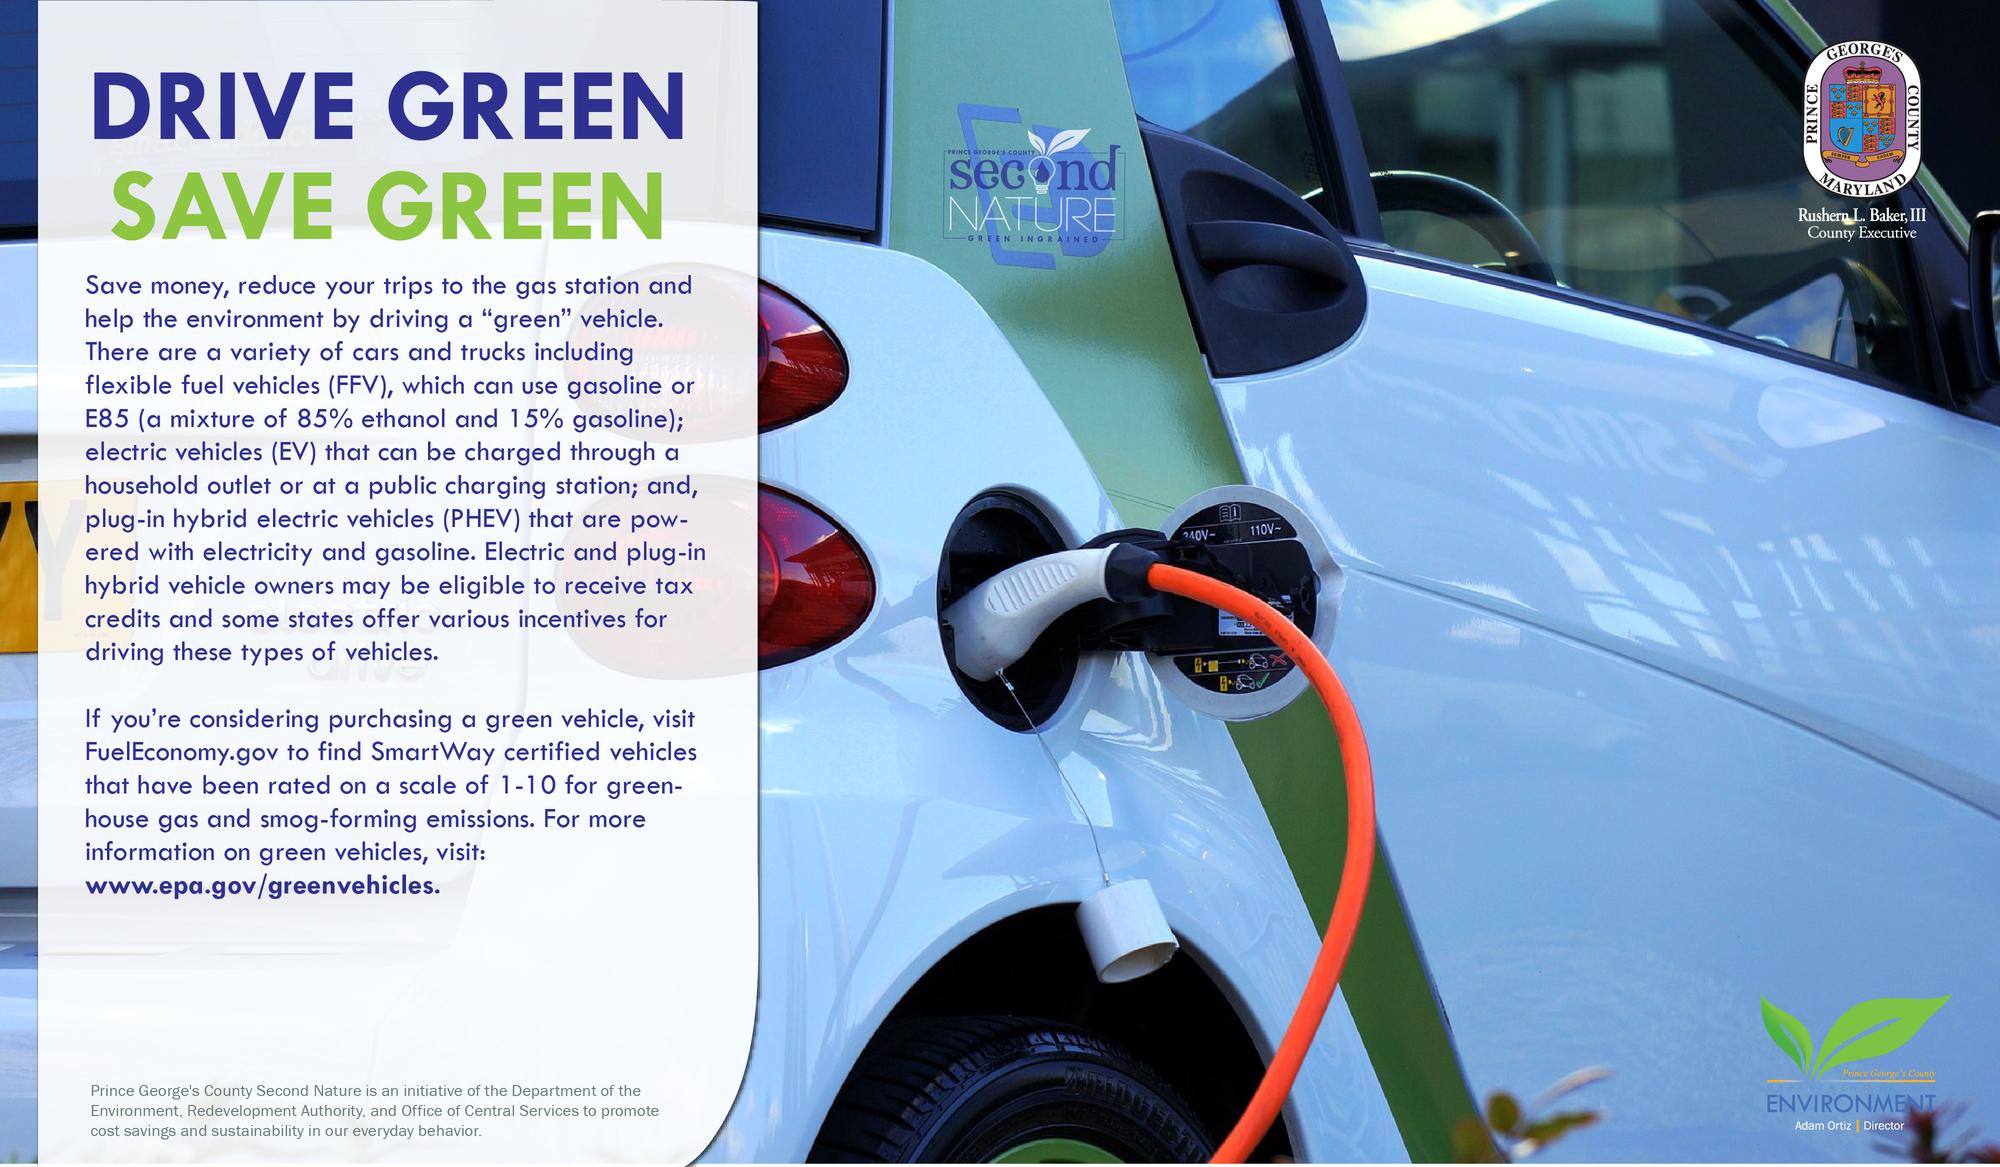 Drive Green, Save Green